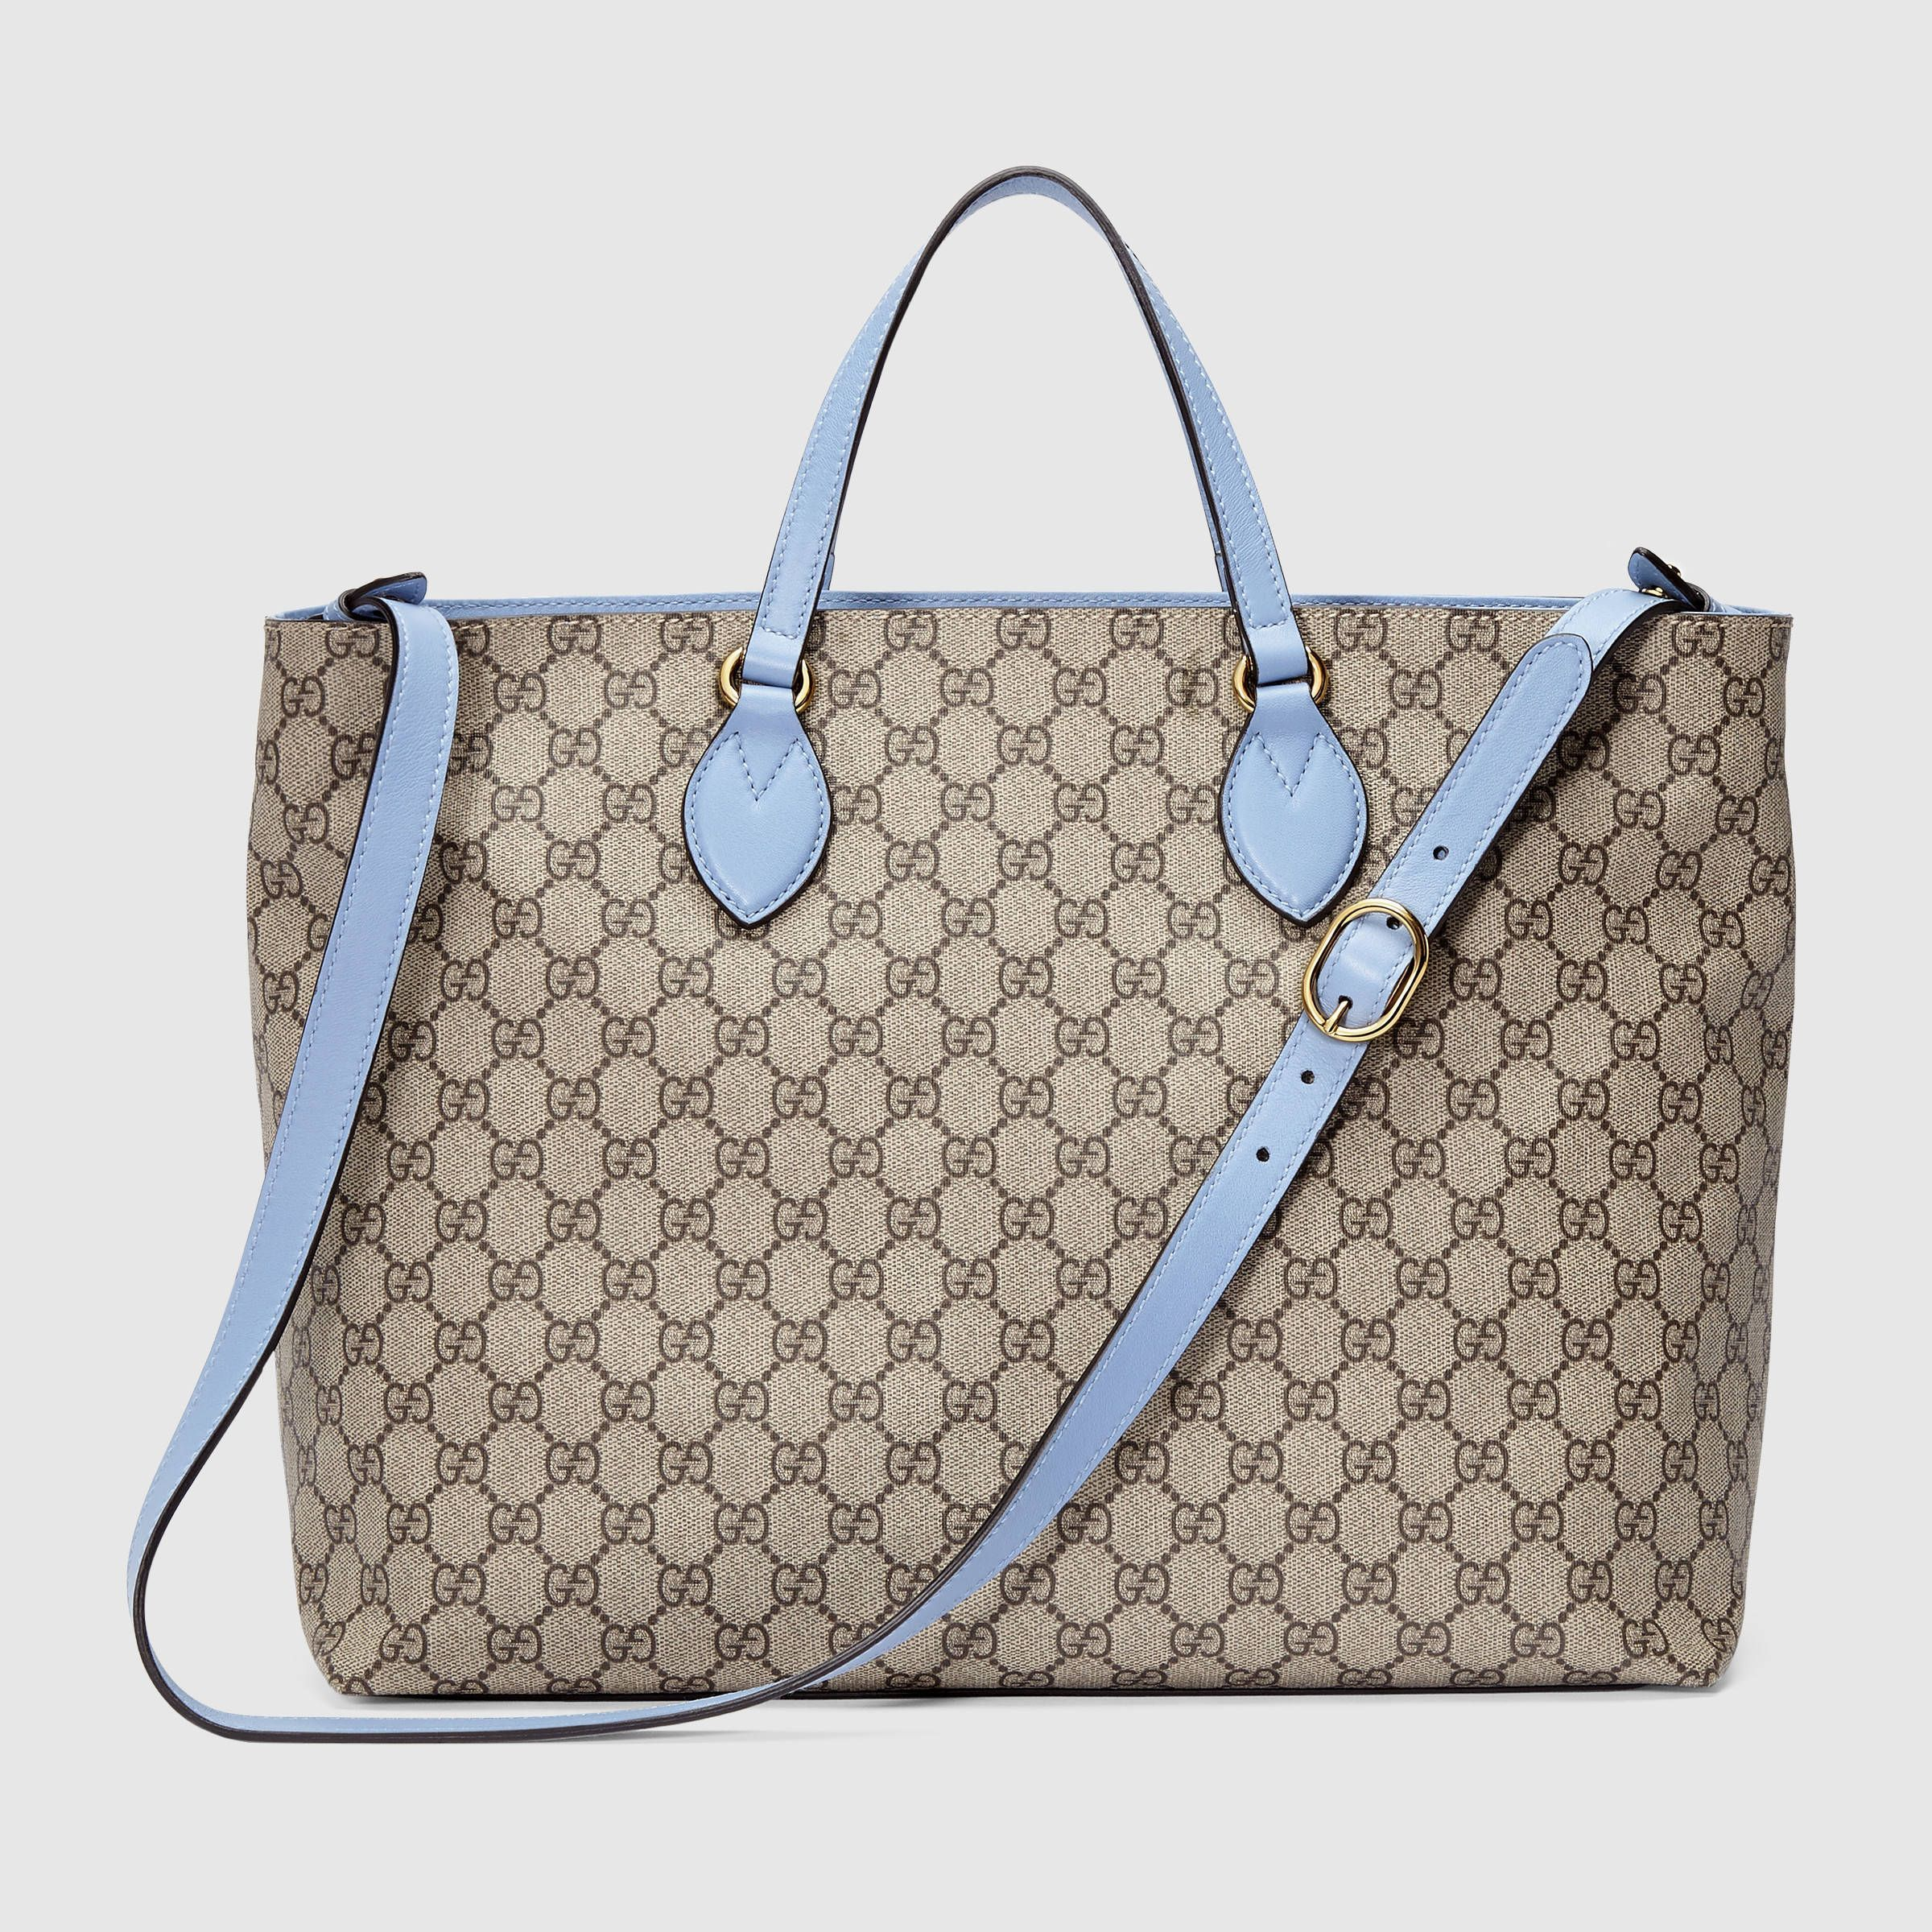 Soft Gg Supreme Diaper Bag Gucci Newborn Bags 457356k5icg8314